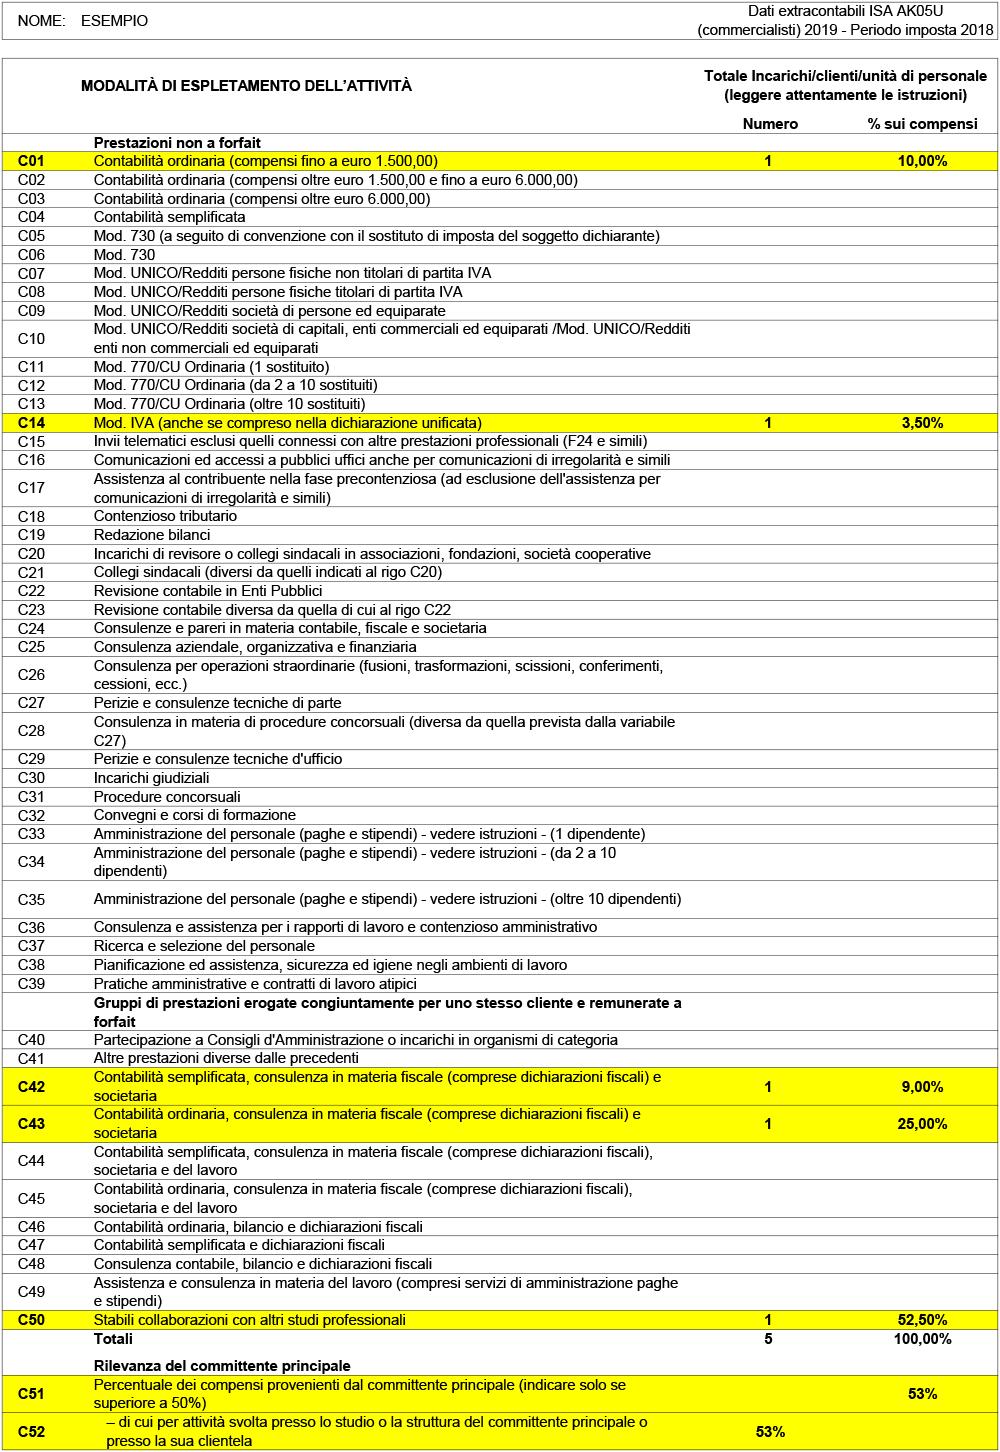 DATI ISA AKO5U COMMERCIALISTI 2019 - Immagine 2 / 2